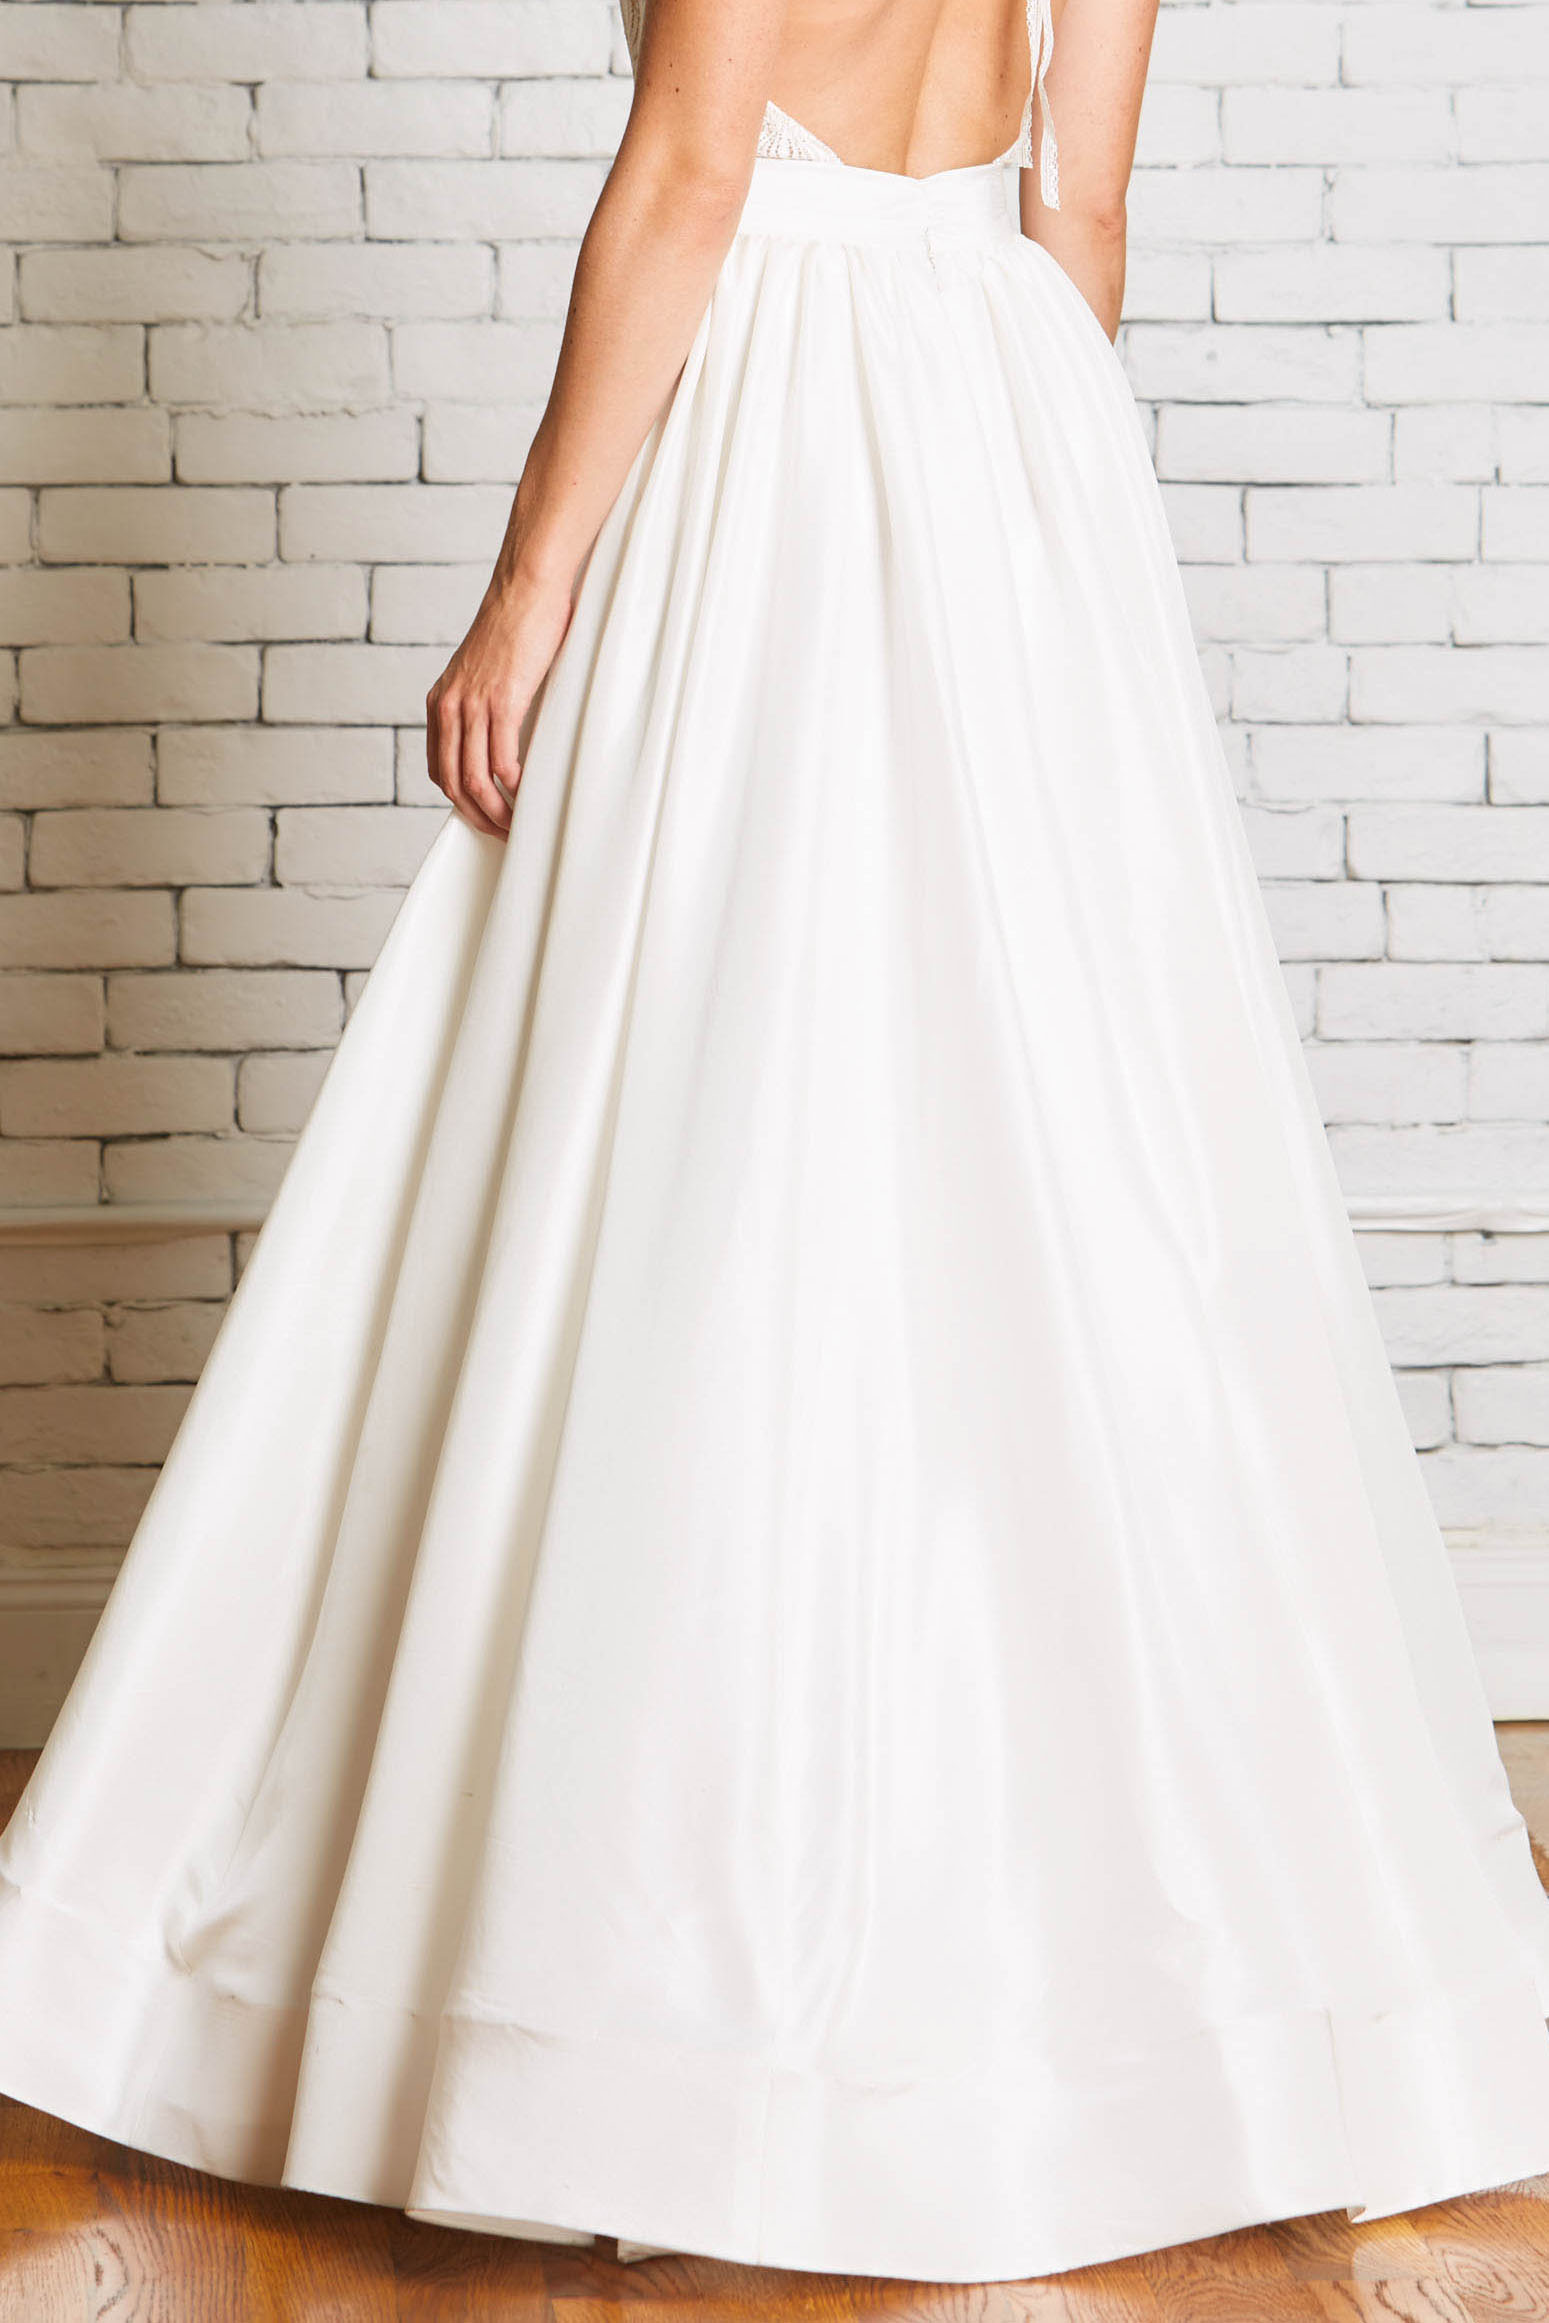 12b.Rebecca_Schoneveld_Olivia_Skirt_Back-Ballgown_Skirt_Separates_Mix_and_Match_Modern_bride.jpg